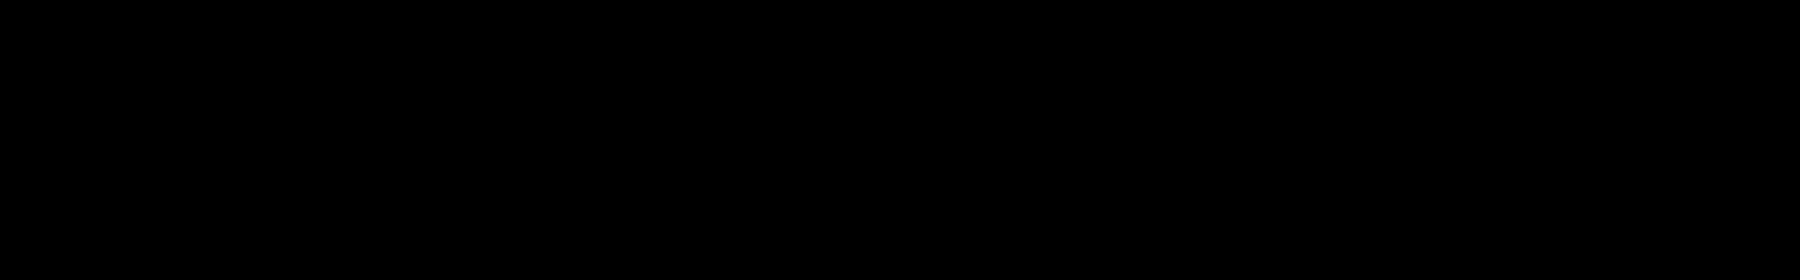 Universal Bass audio waveform